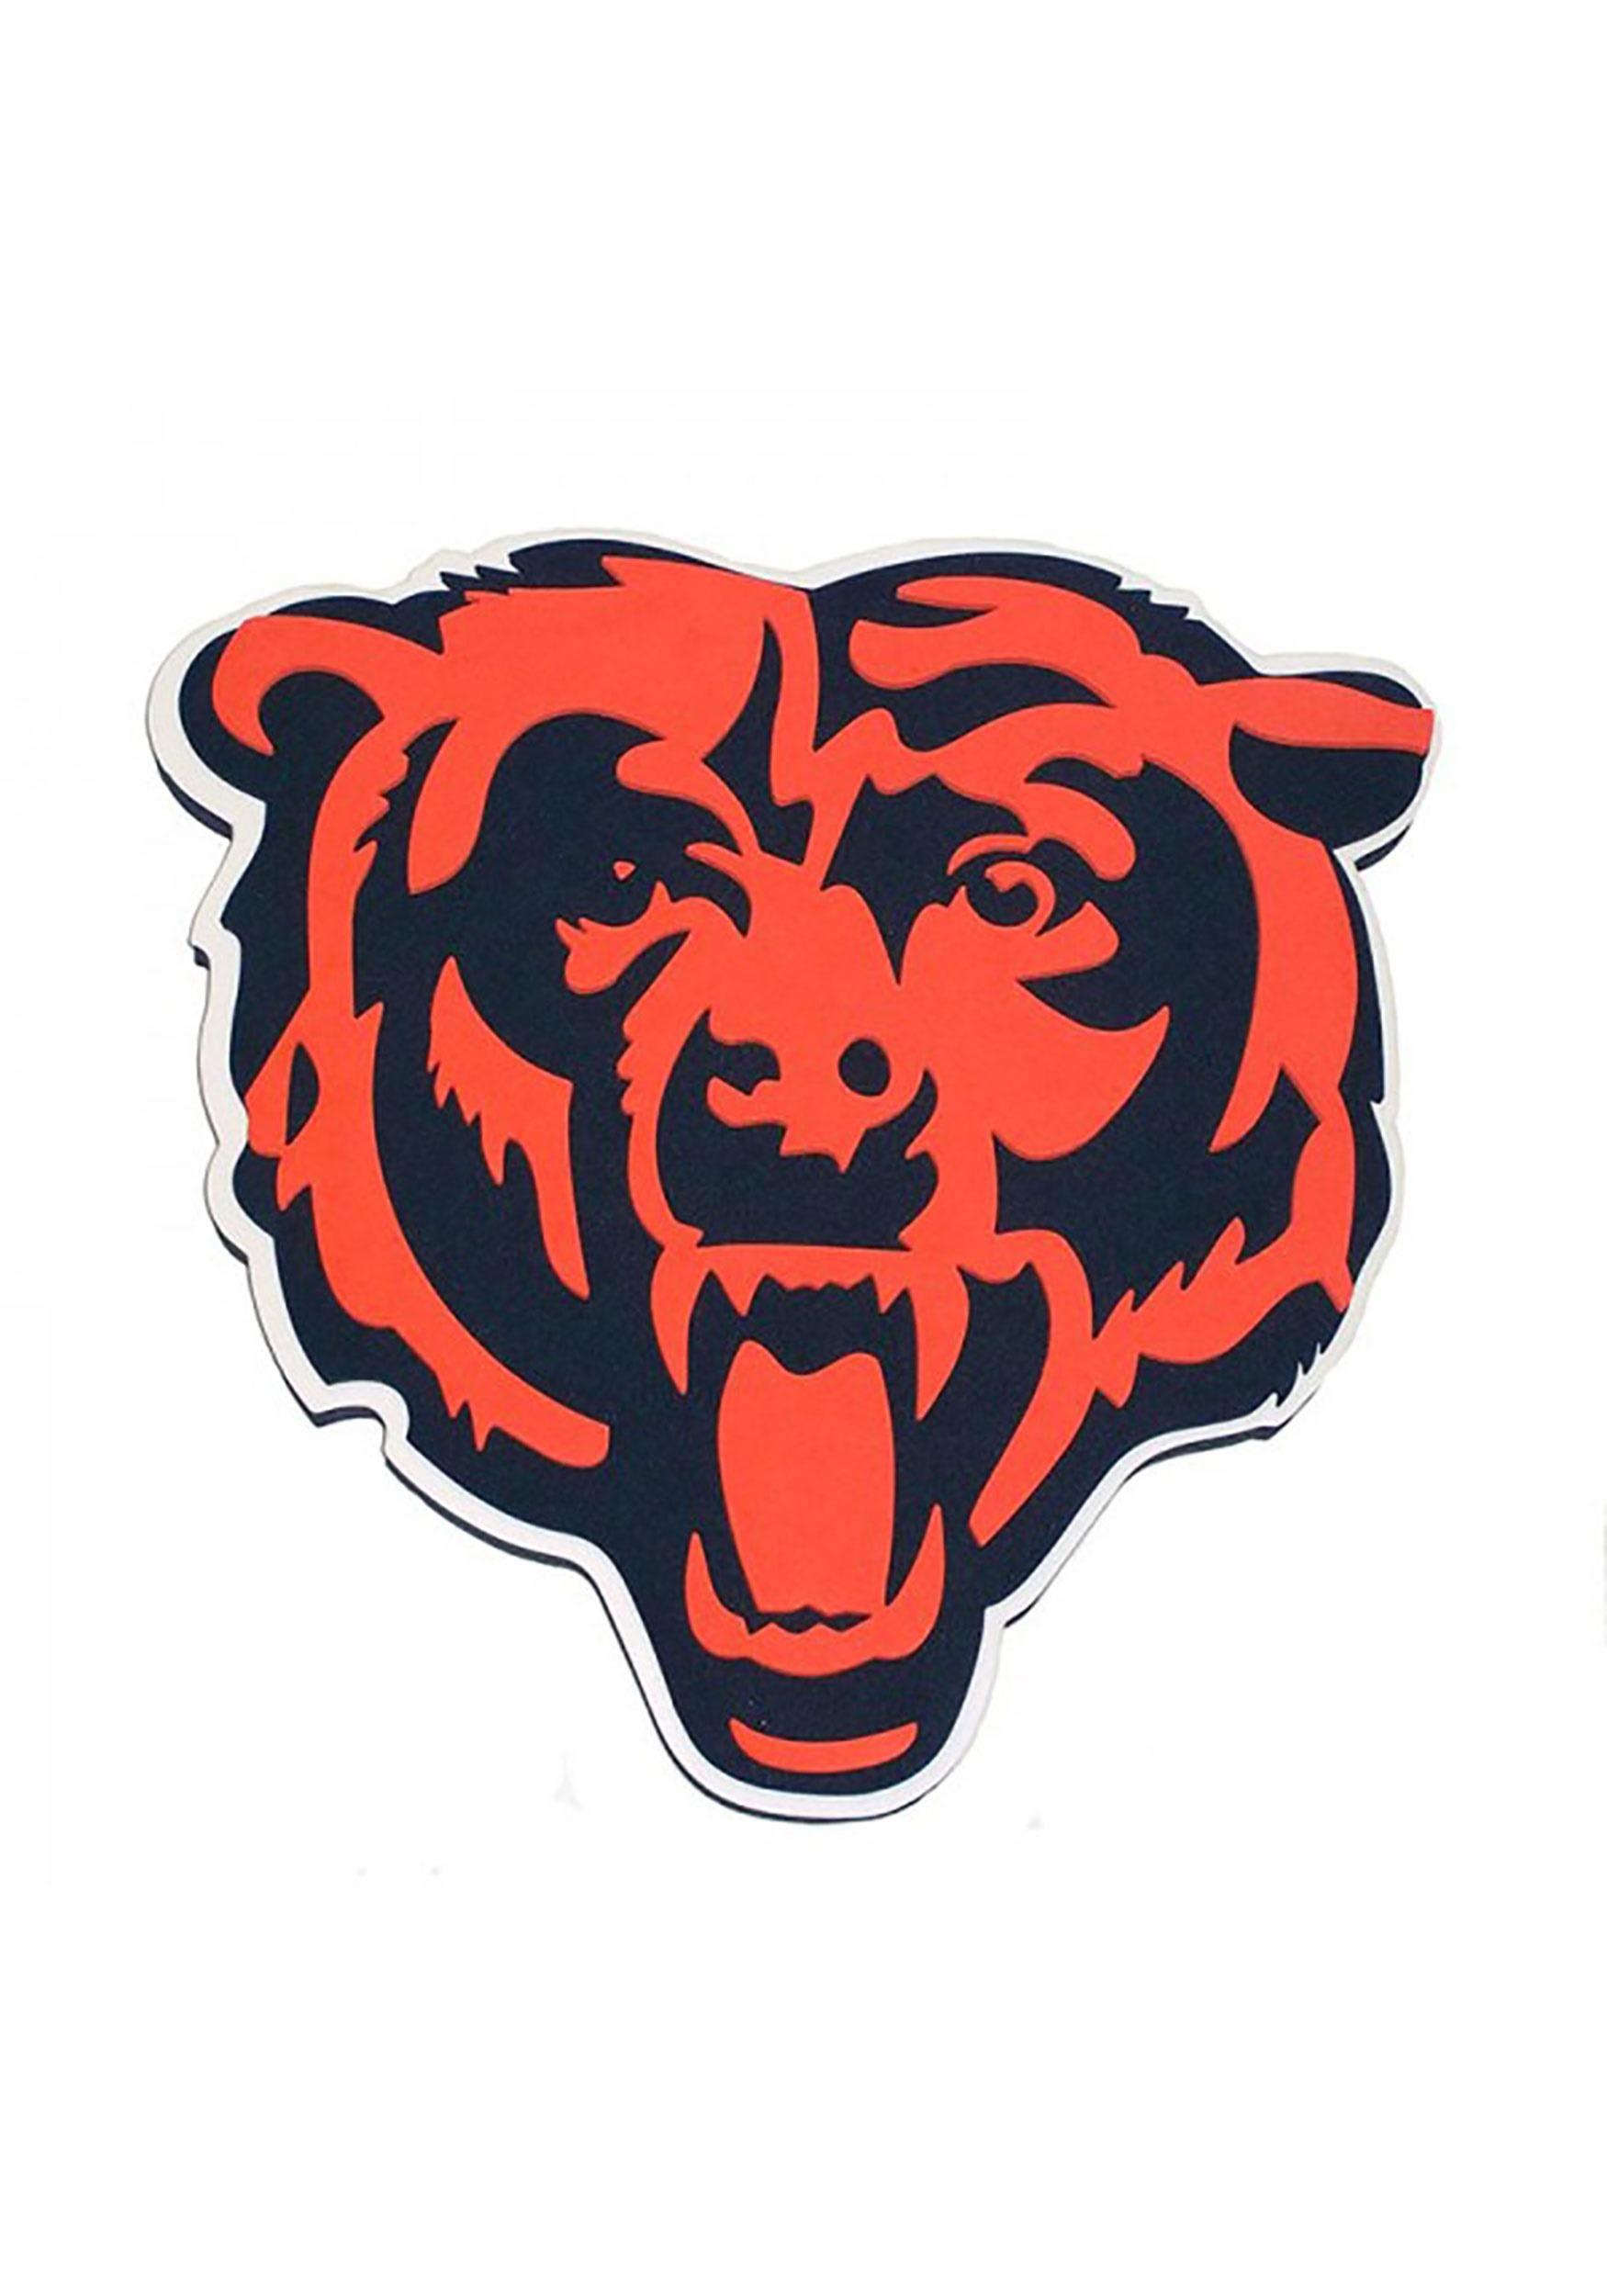 ae1508a4 NFL Chicago Bears Logo Foam Sign